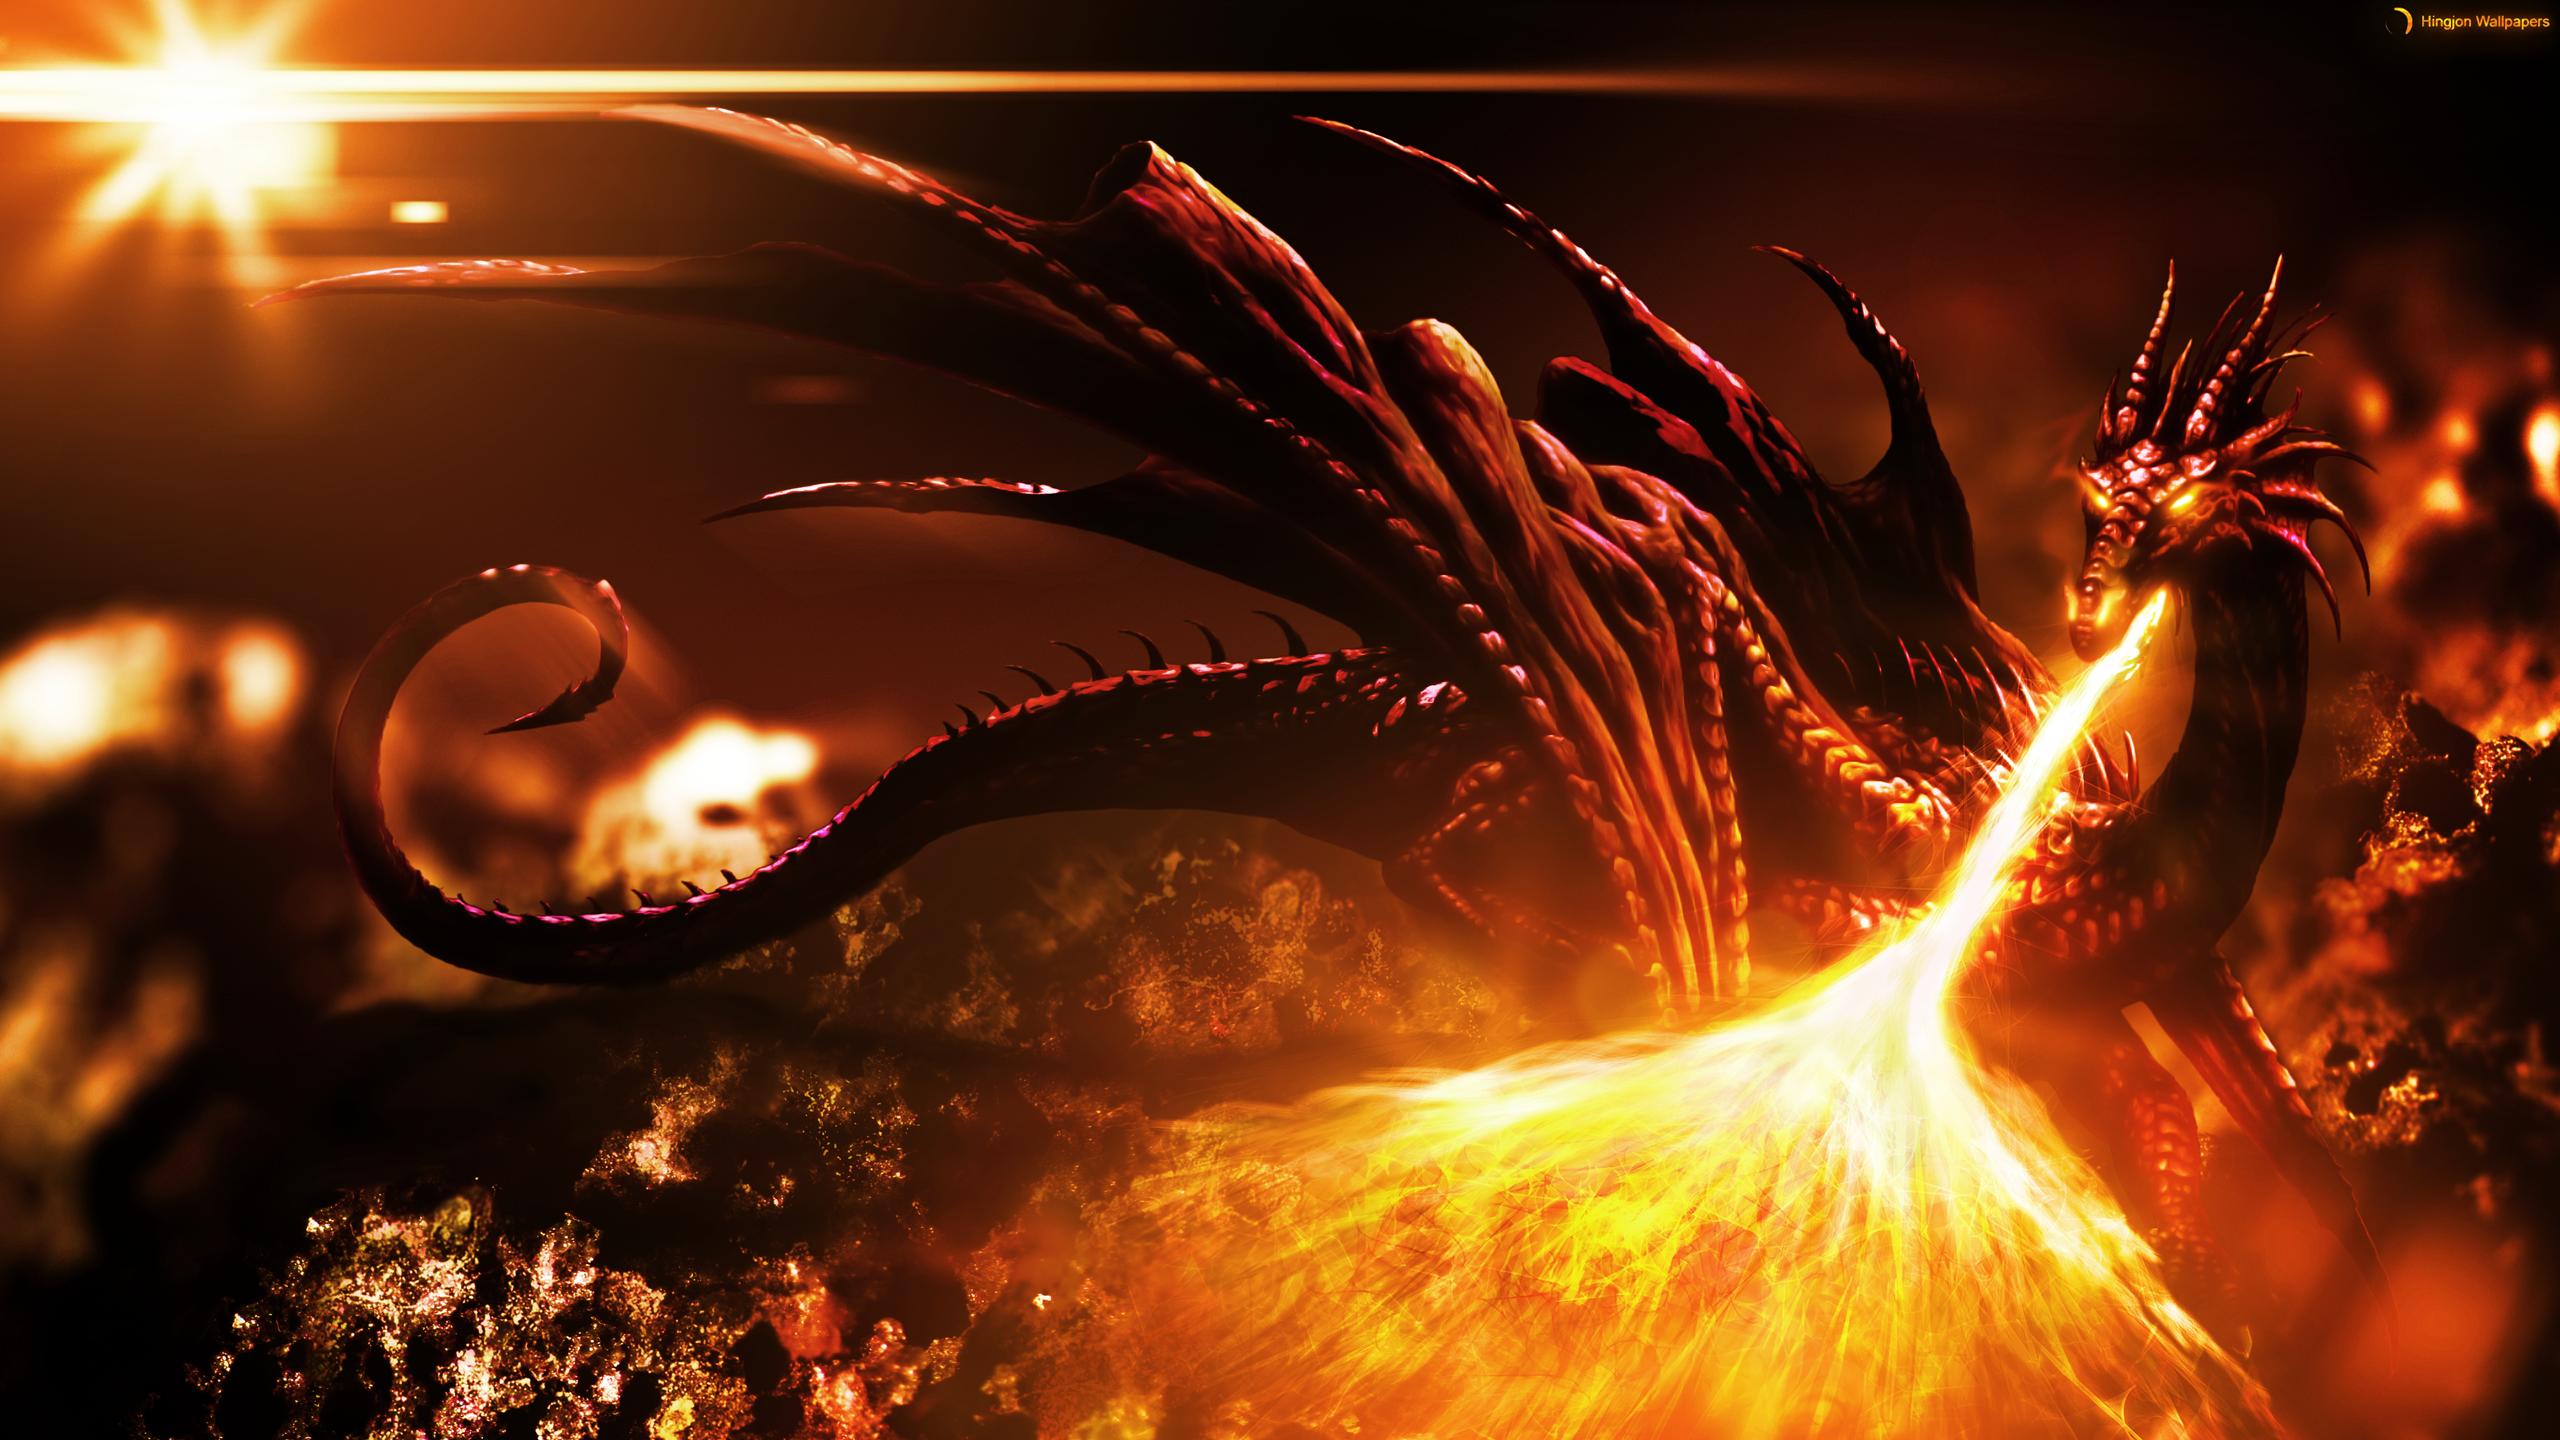 Dragon Breath by HingjonWallpapers on DeviantArt